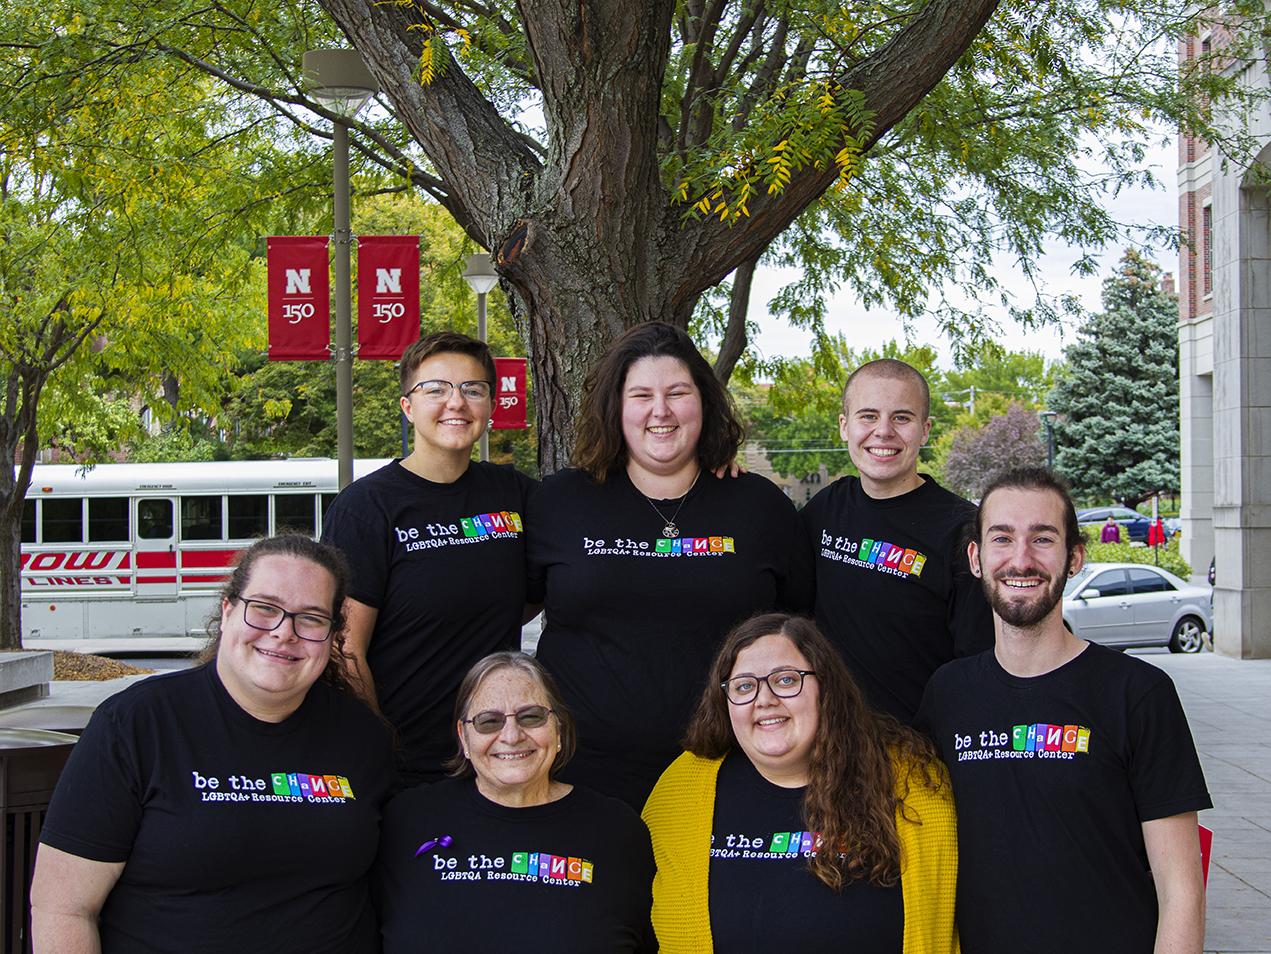 The staff of the LGBTQA+ Center at the University of Nebraska-Lincoln